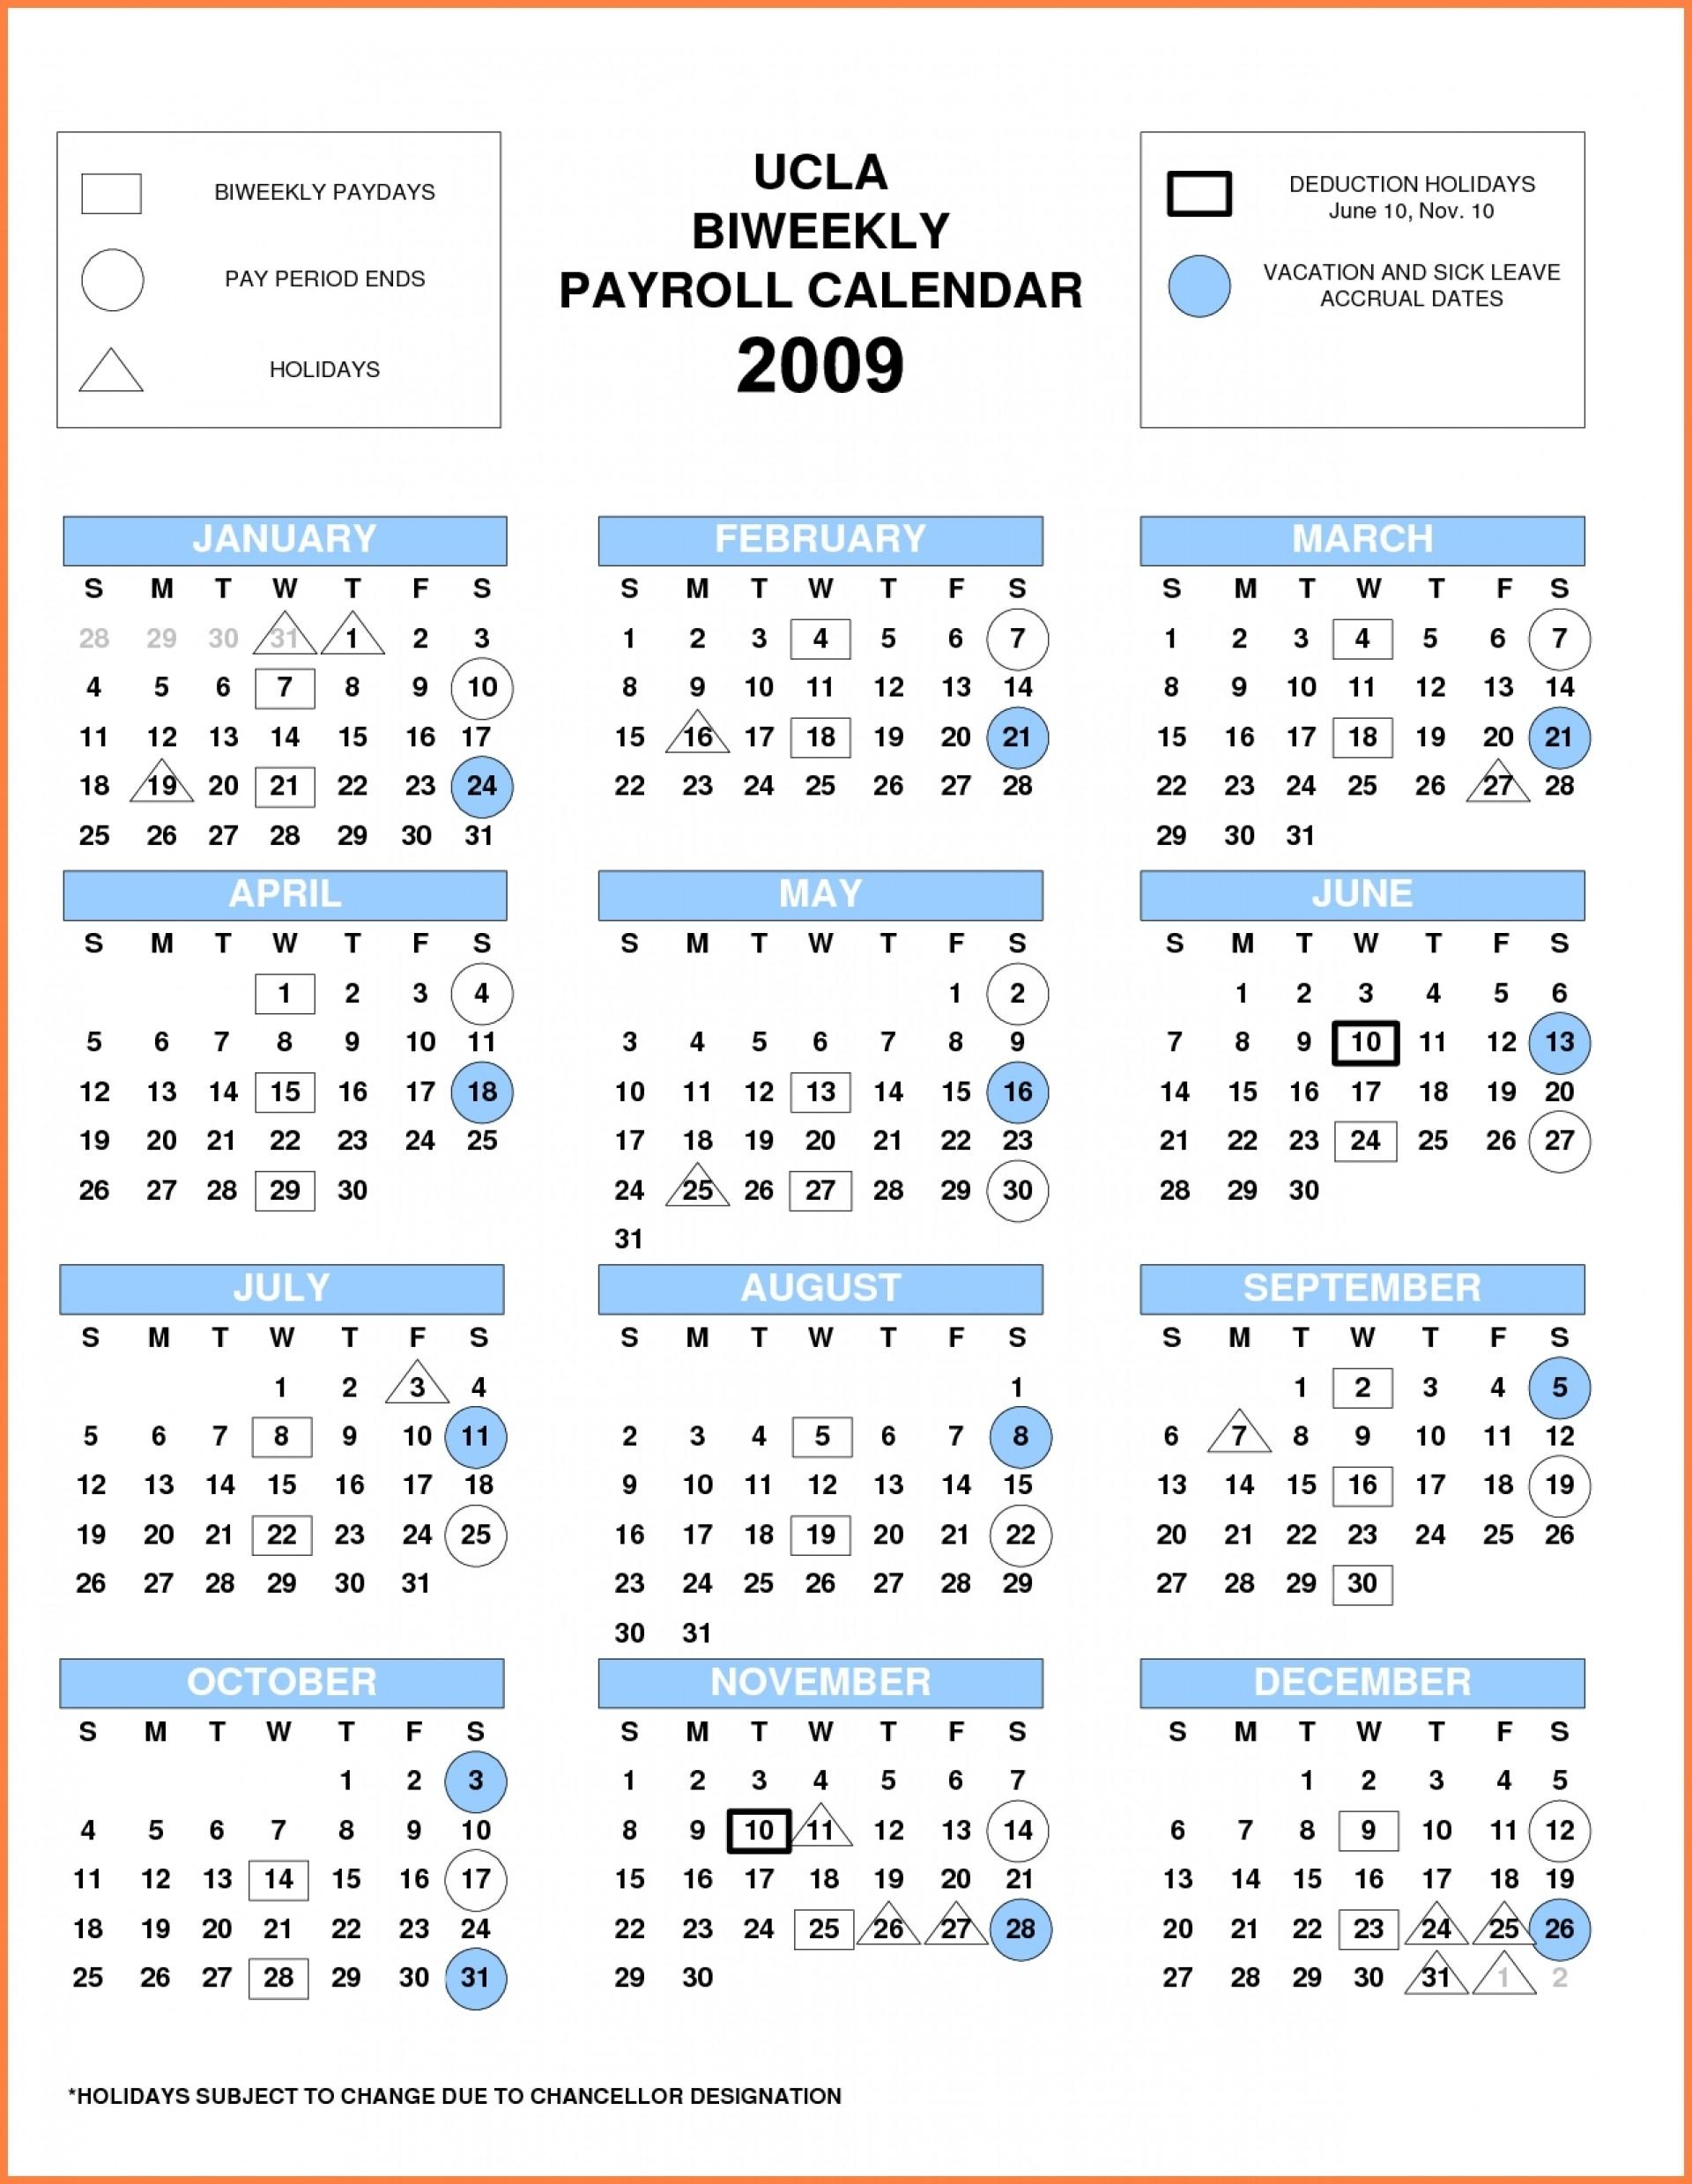 2020 Federal Pay Period Calendar Printable - Template throughout 2022 Federal Payroll Calendar Printable